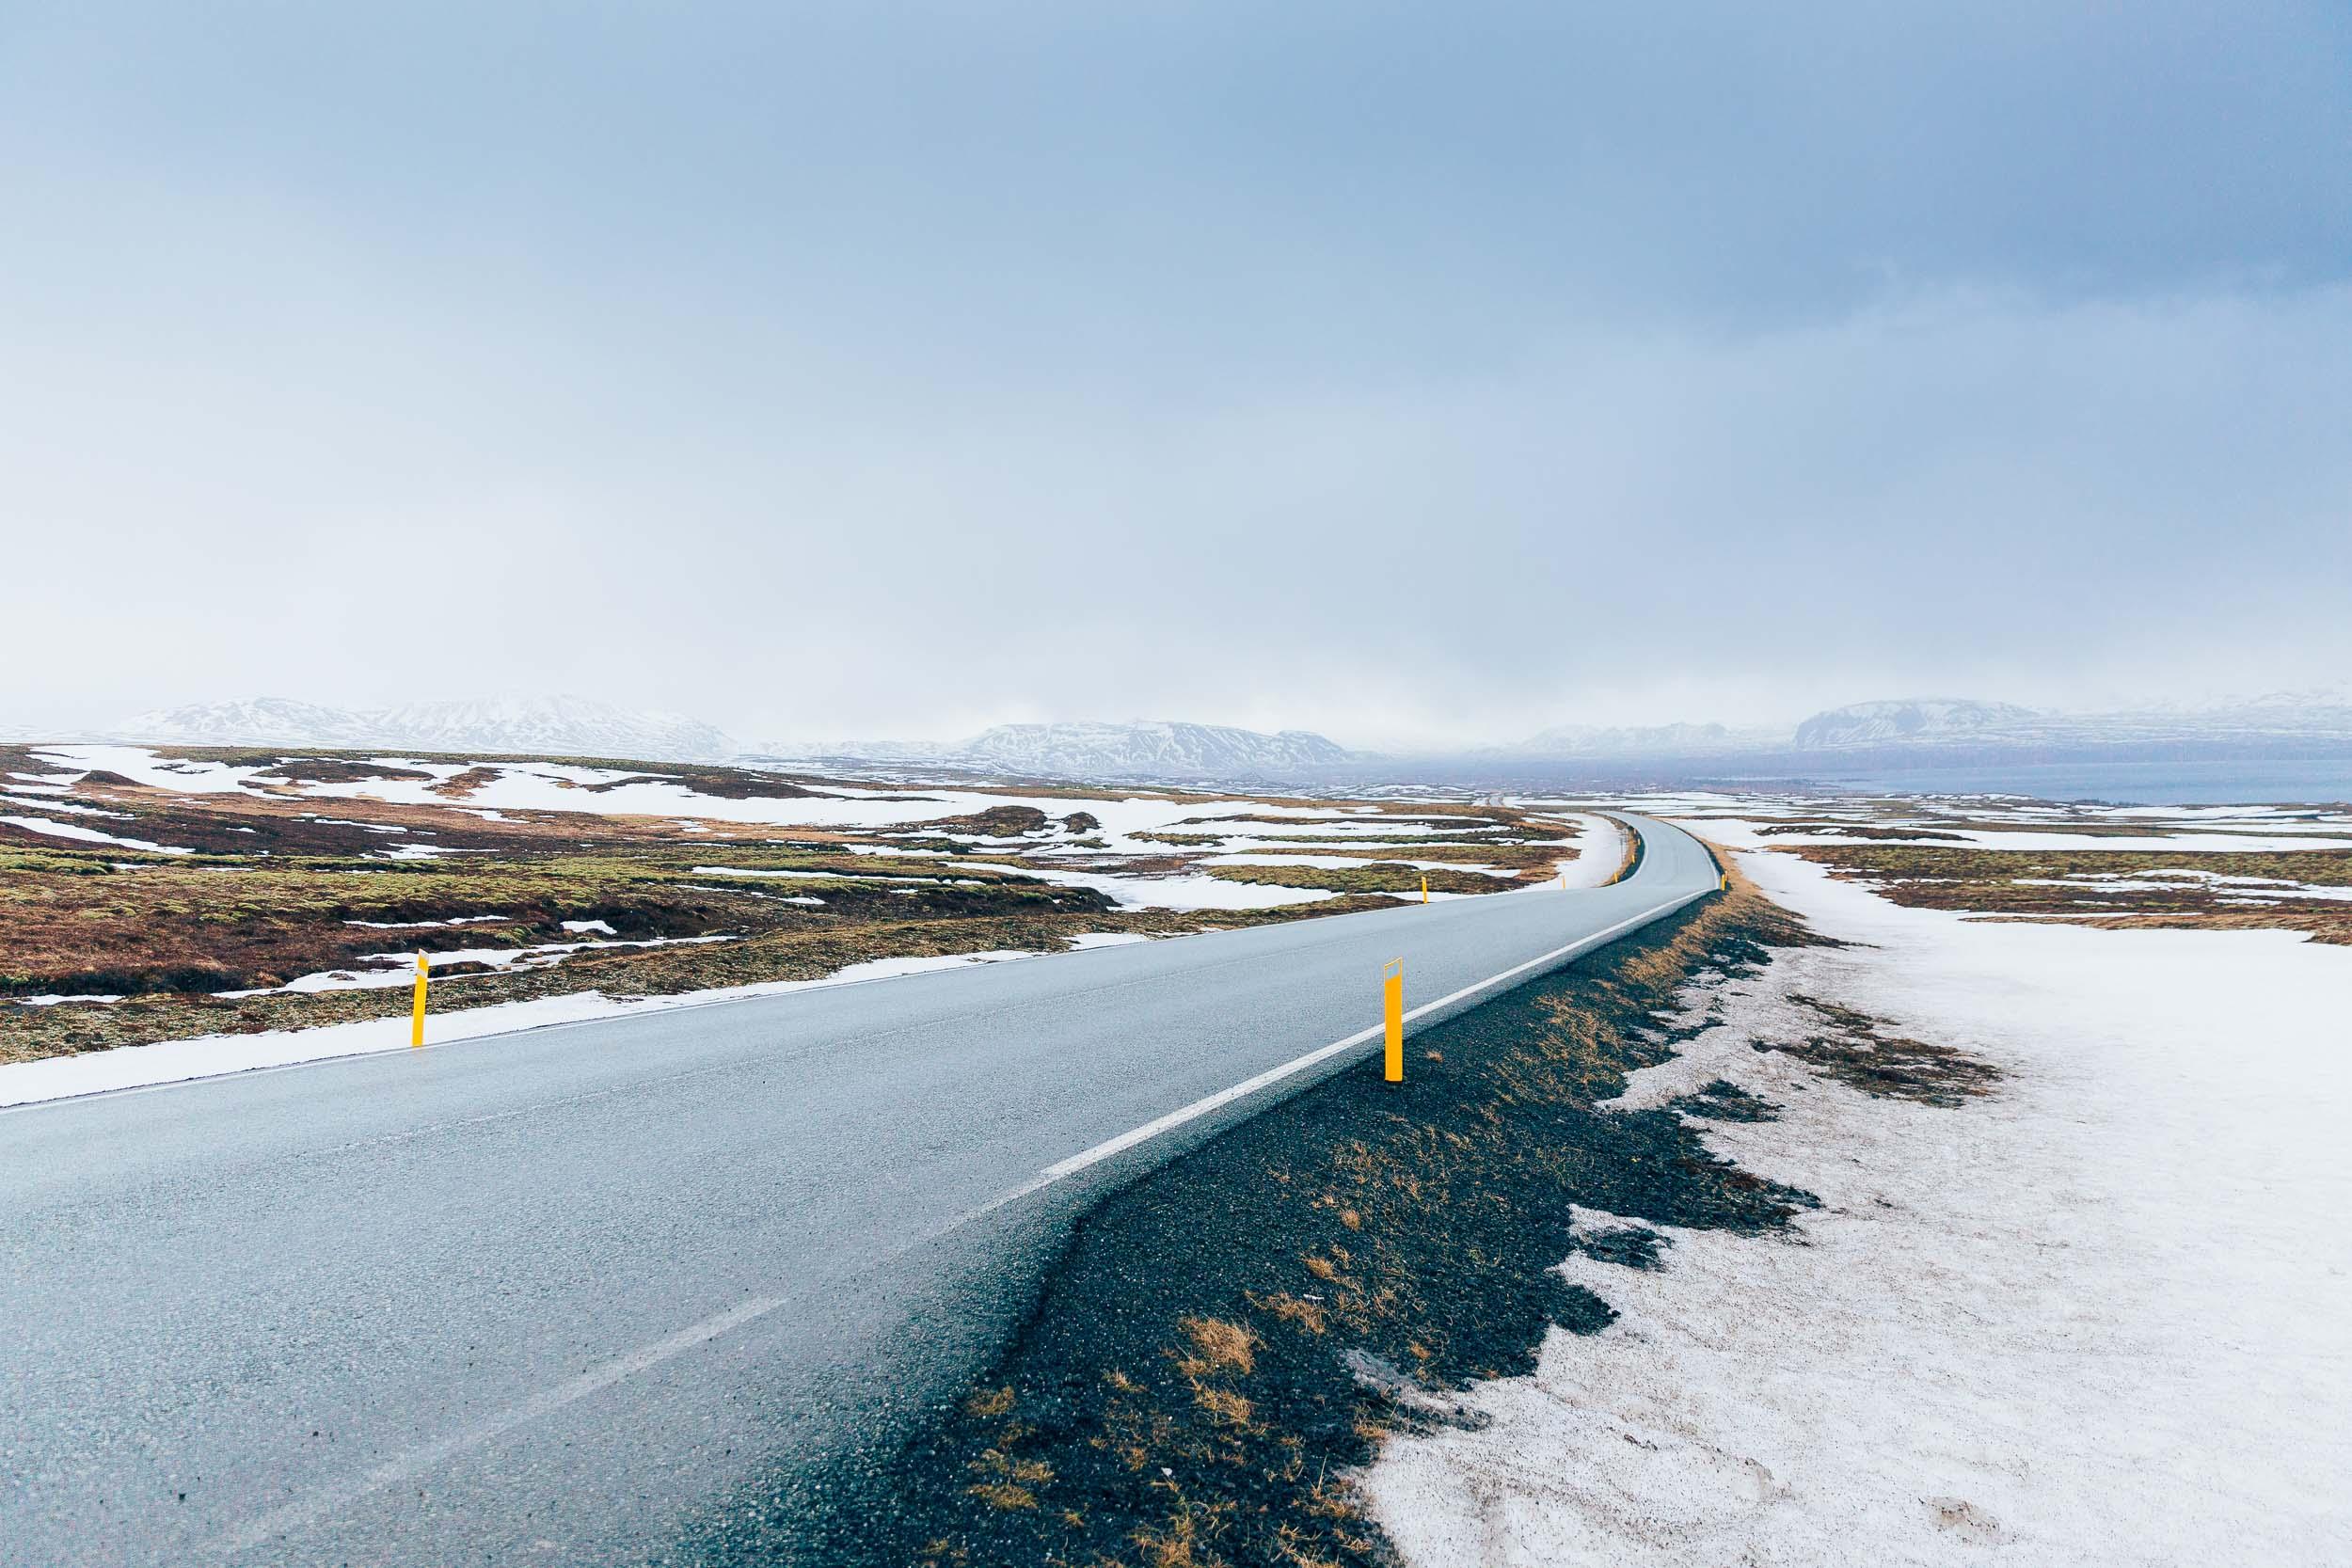 02_2019_Iceland-256.jpg